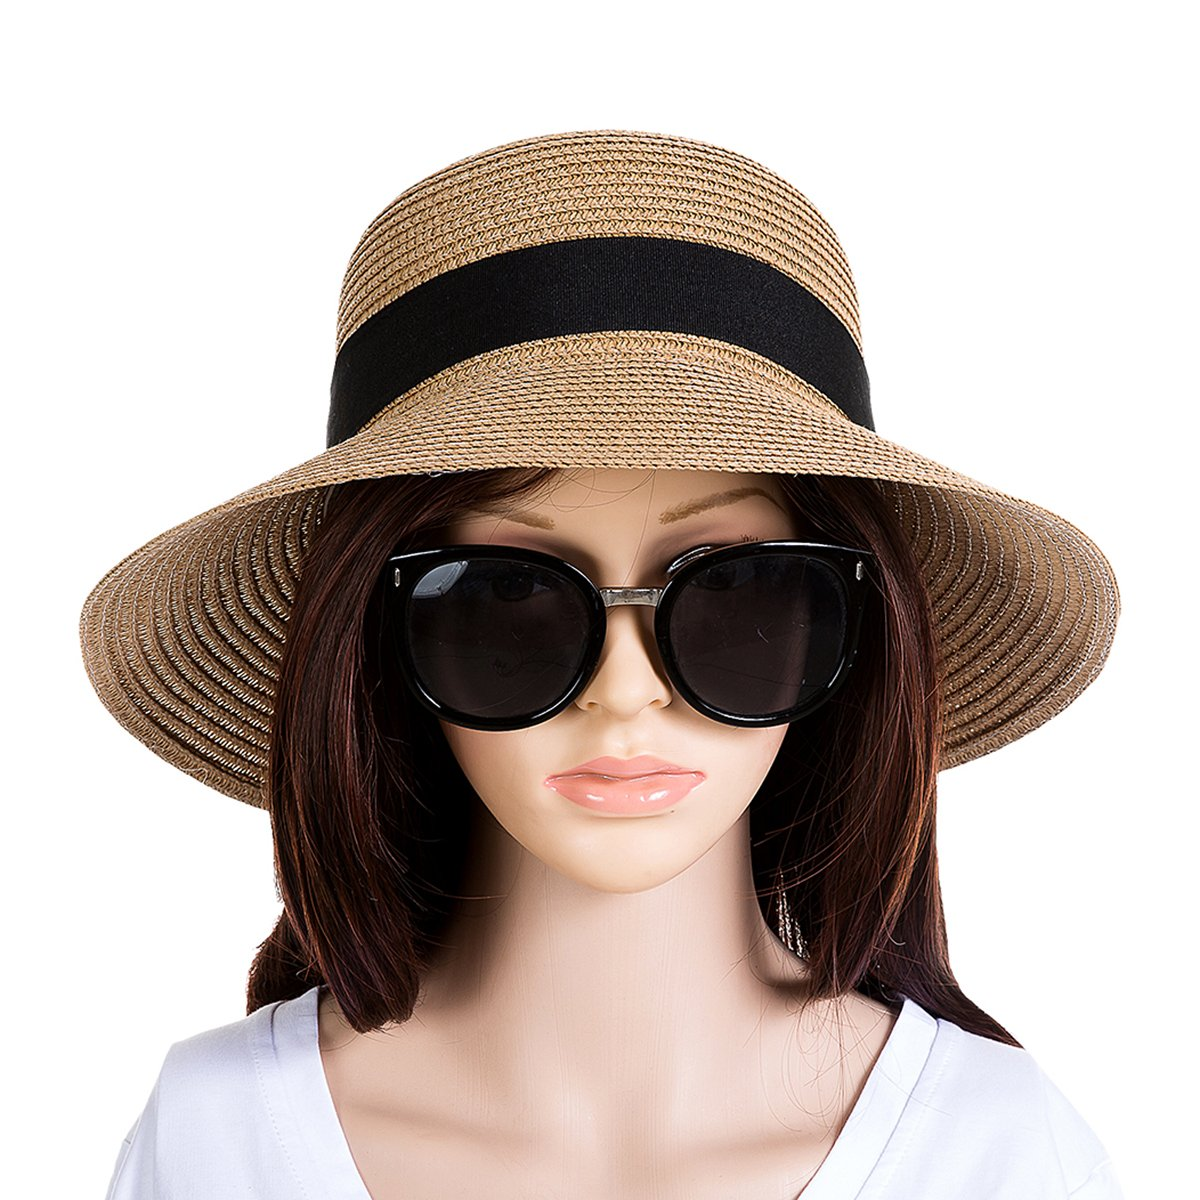 Annie Women's Cute Summer Sun Hat Brim UPF 50 Protection Straw Beach Hat (Khaki)